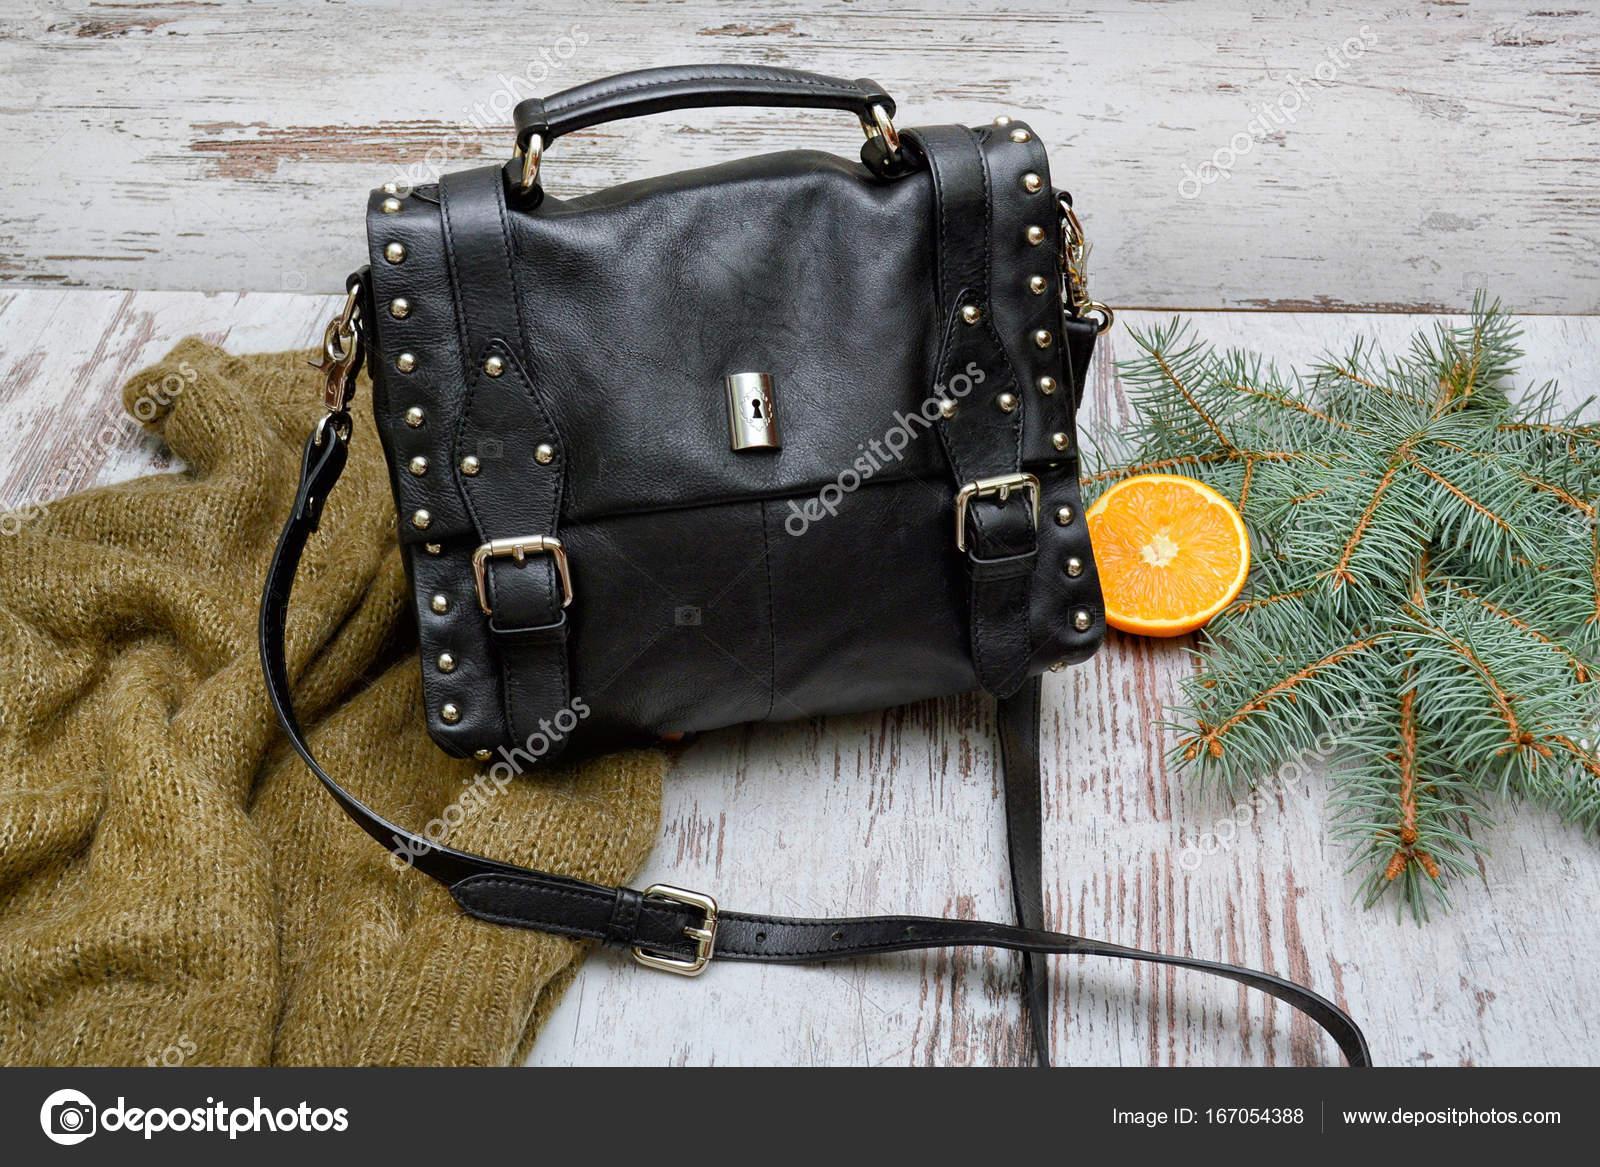 76a3fdc7b7 Μαύρη γυναικεία τσάντα